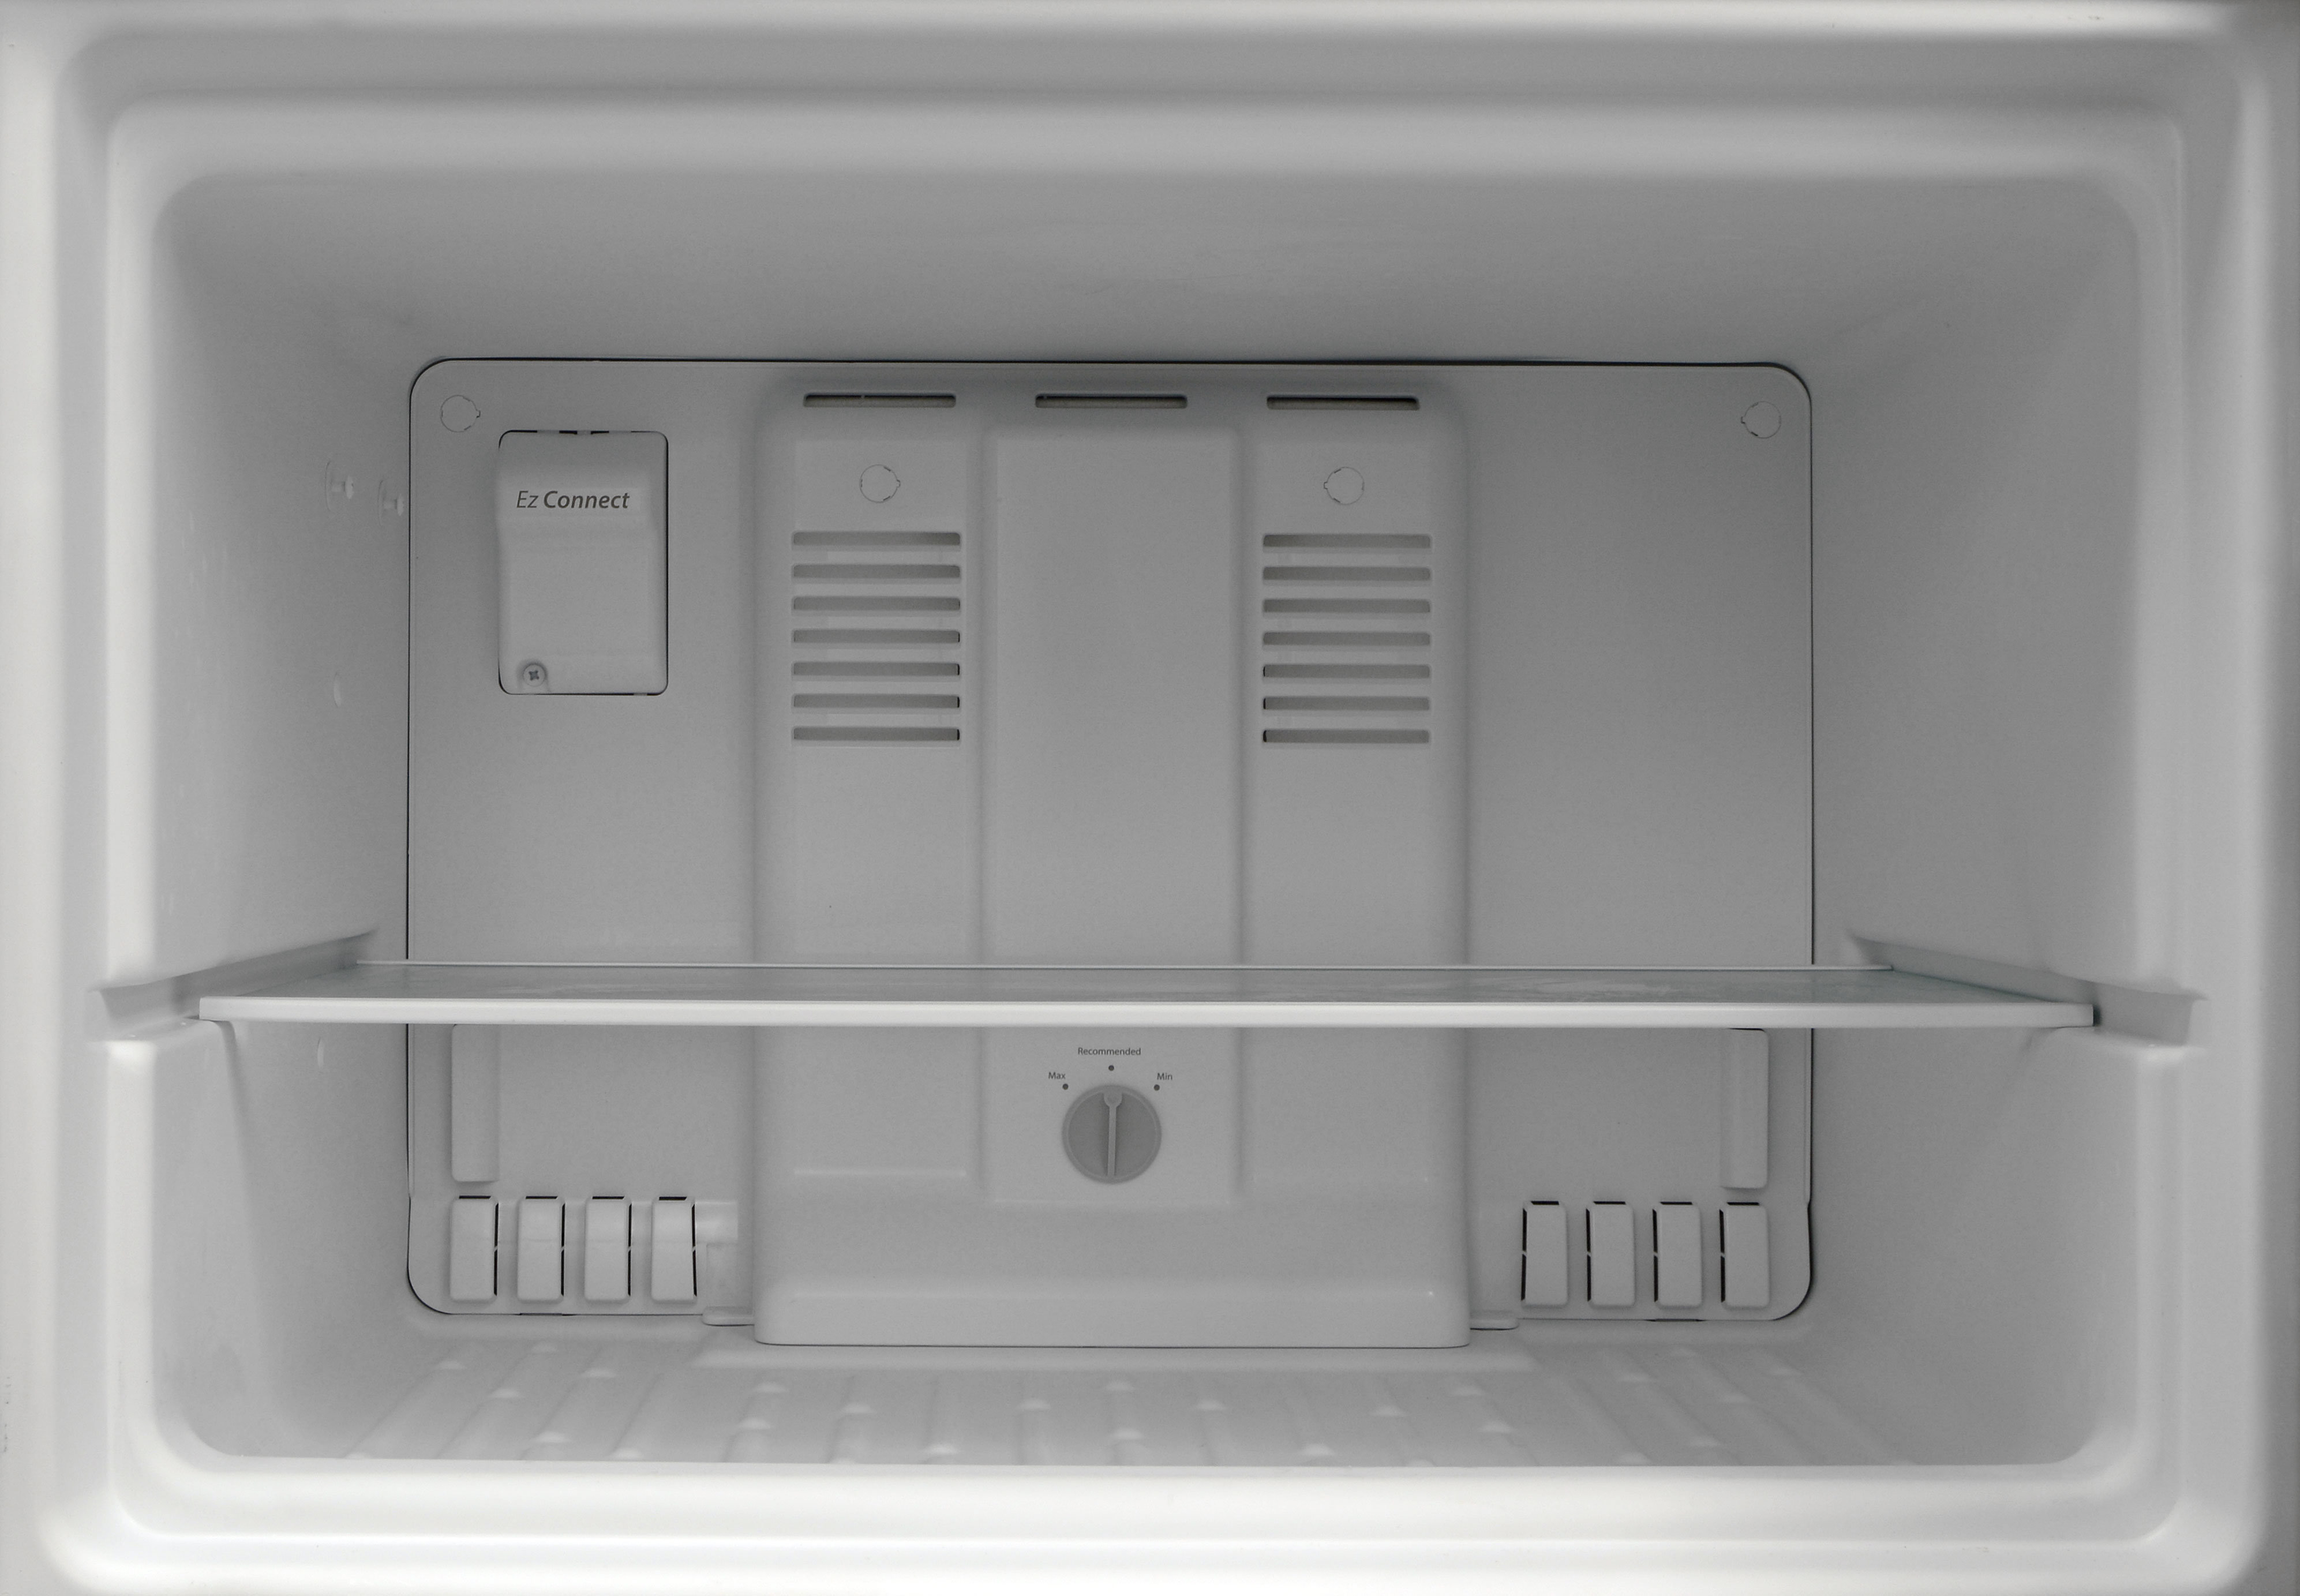 whirlpool wrt318fzdm top freezer refrigerator review refrigerators. Black Bedroom Furniture Sets. Home Design Ideas